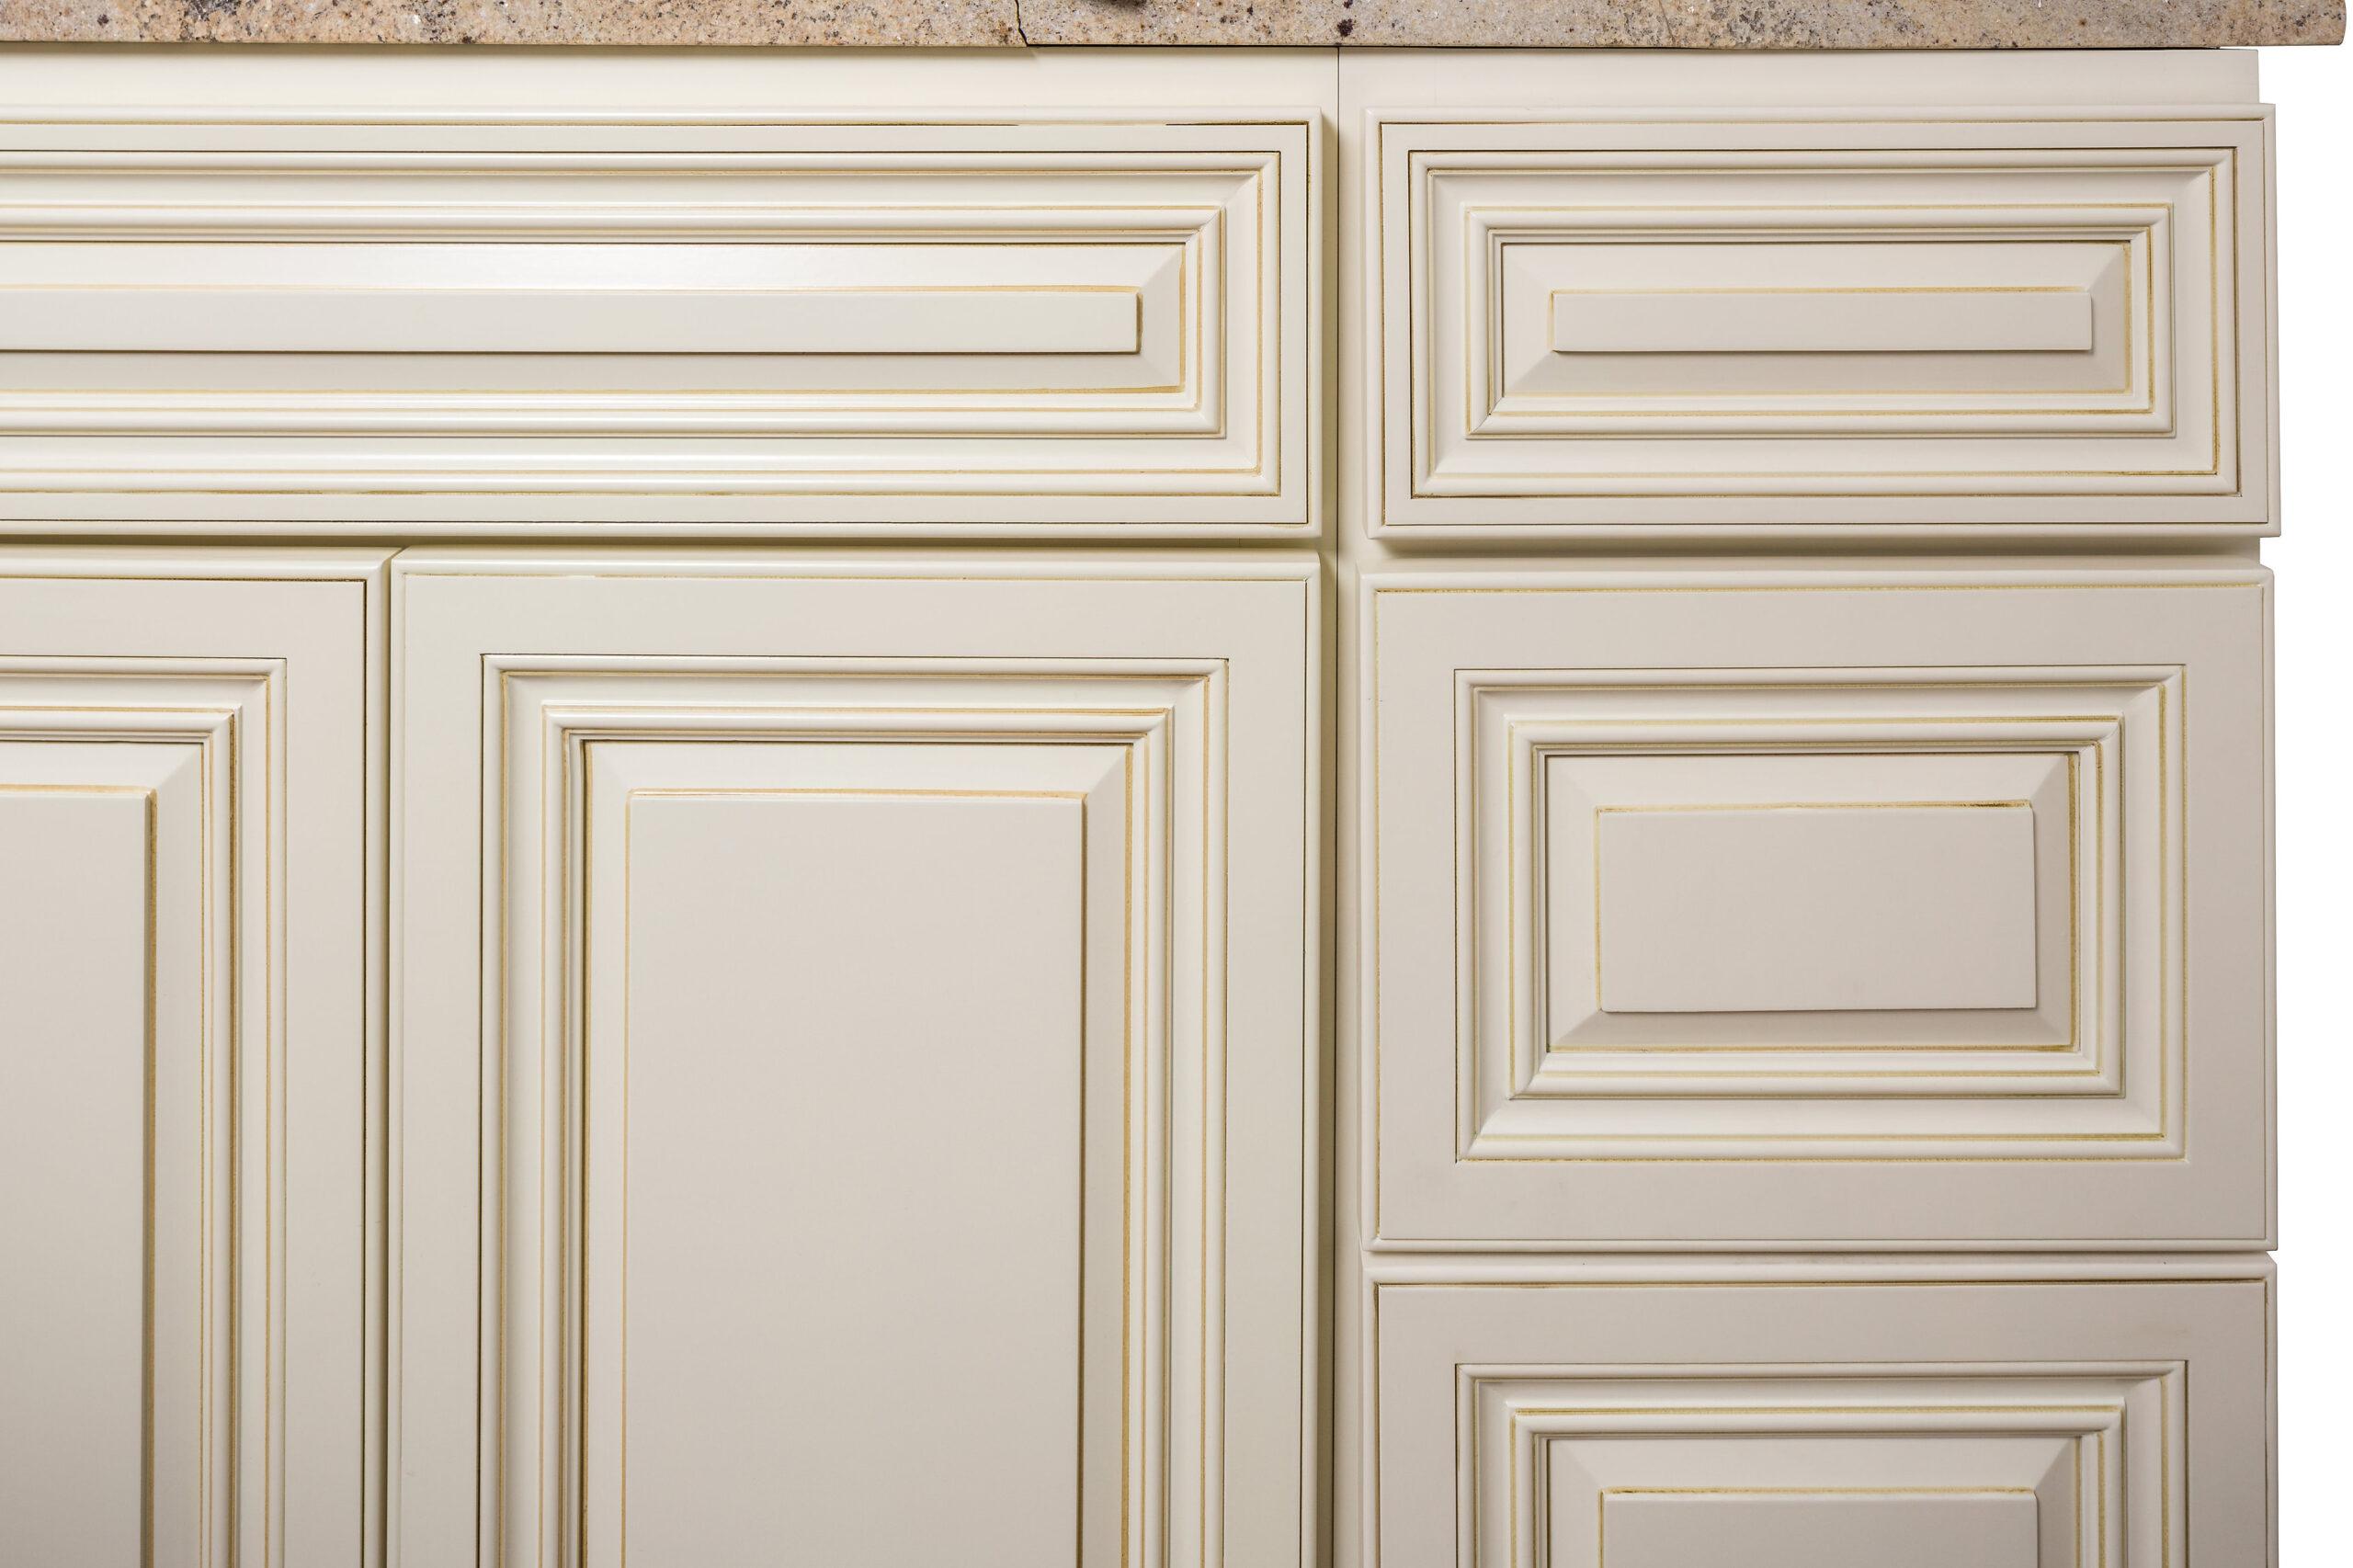 Sc Vanityone Antique White Bathroom Cabinets